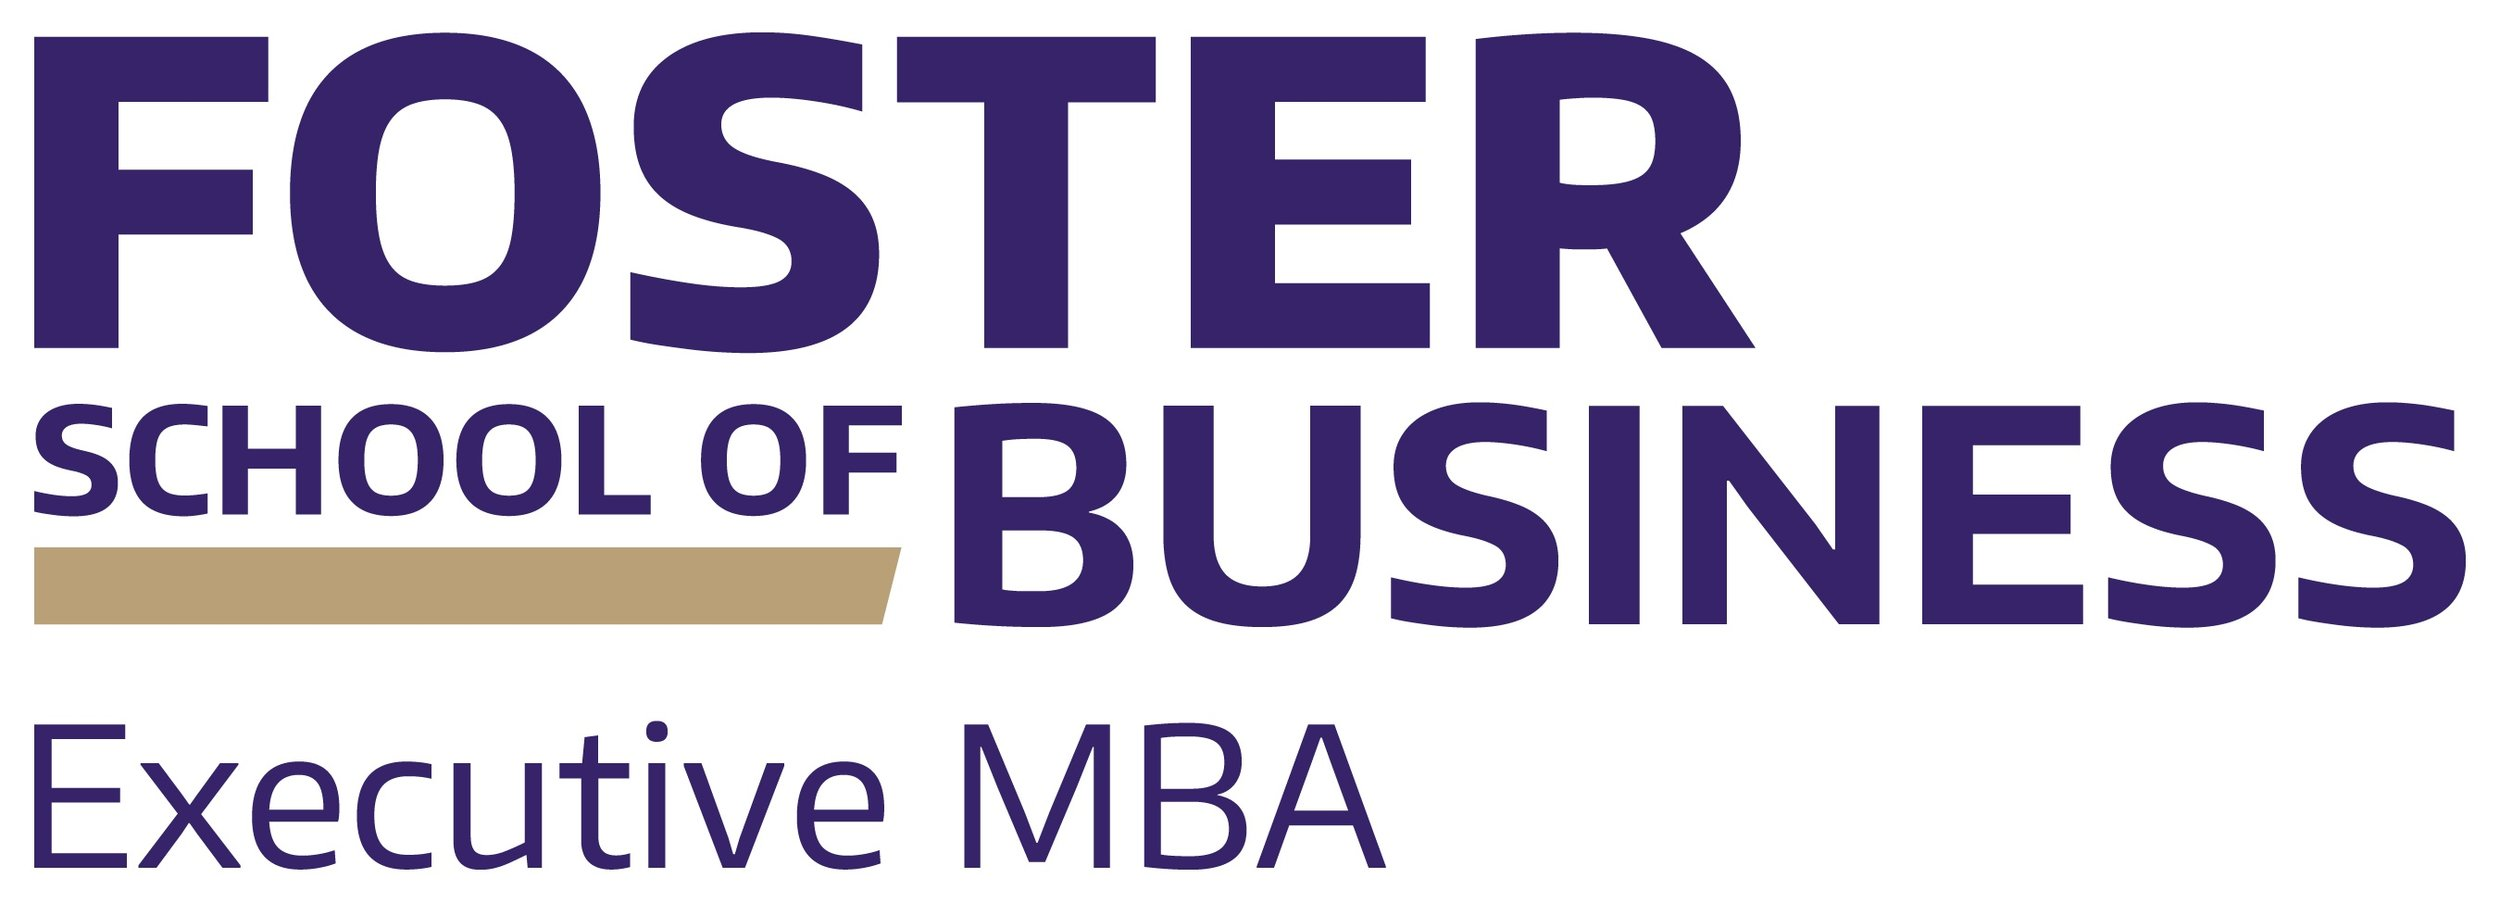 Foster_logo_EMBA_SB_RGB.jpg